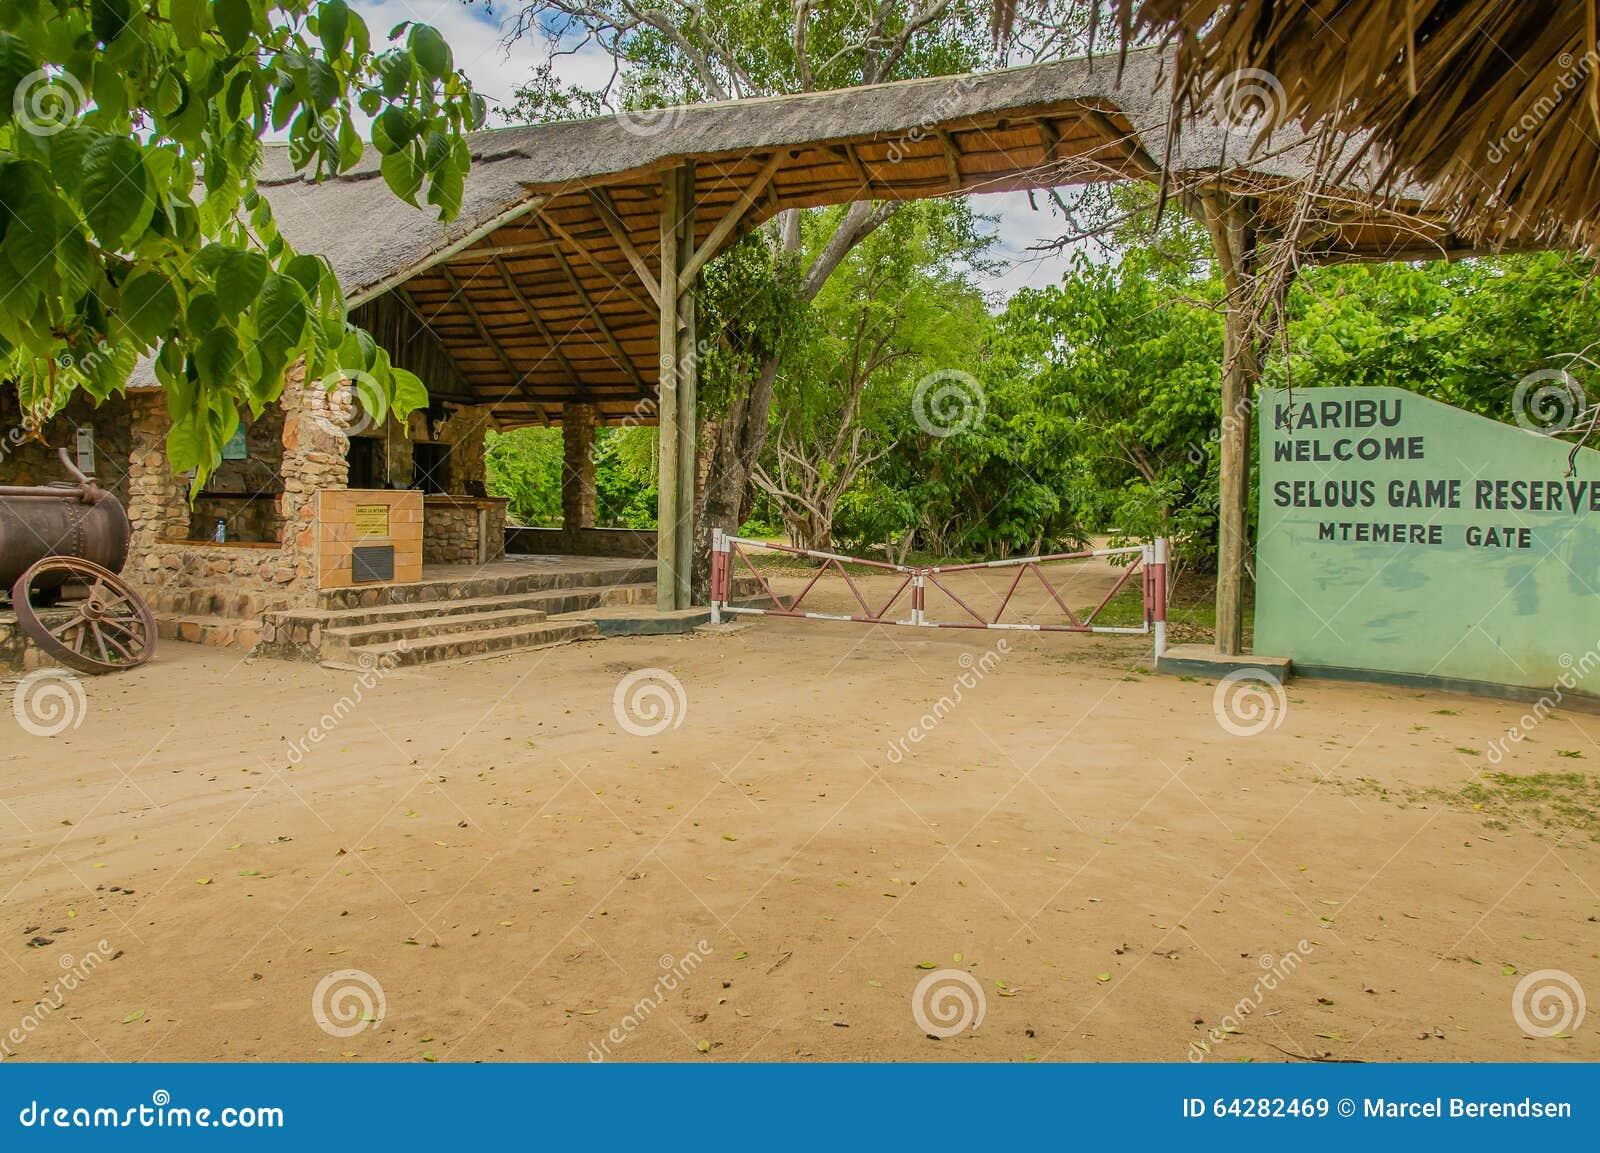 Tanzania - Selous Game Reserve